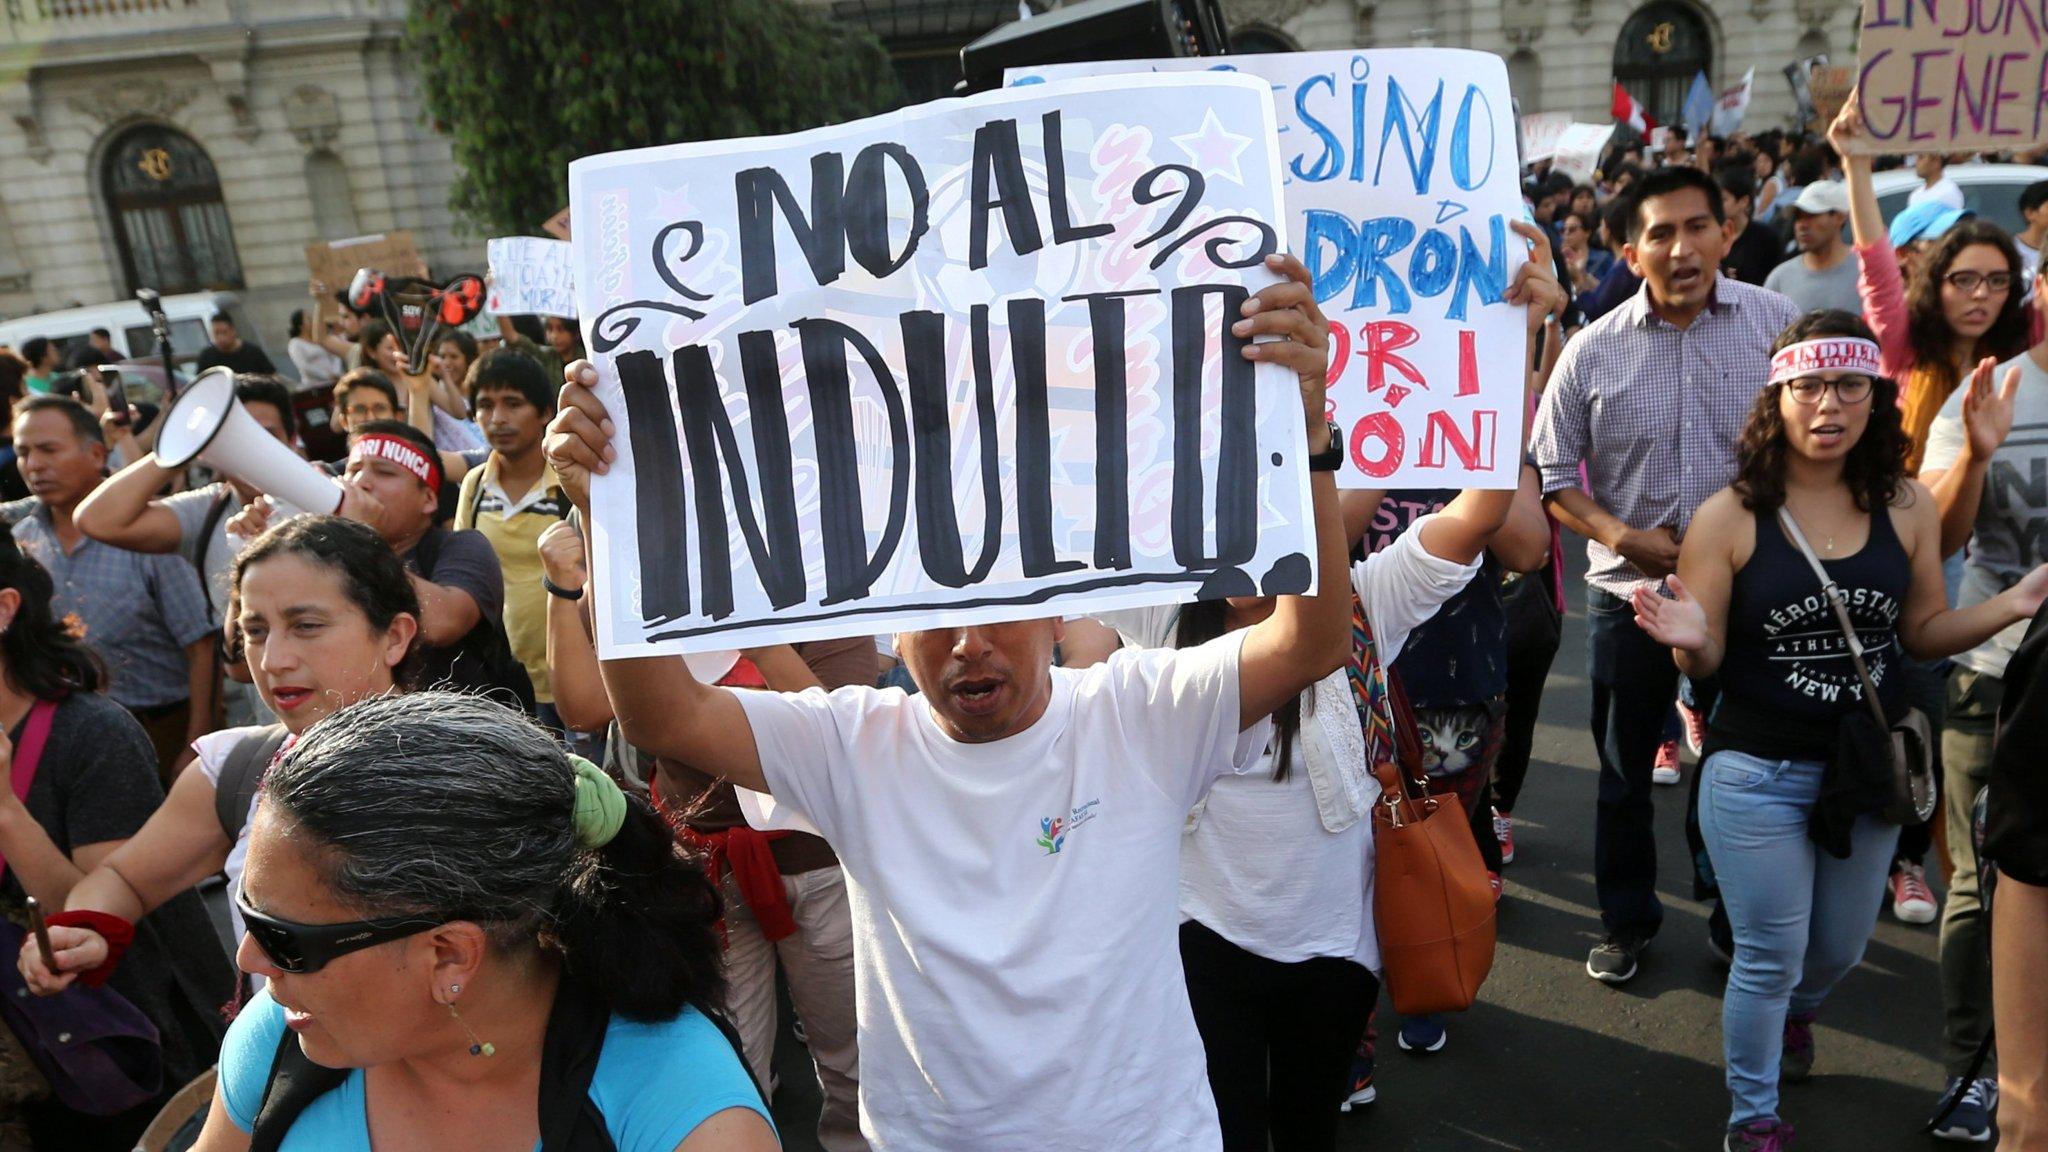 Alberto Fujimori apologises as protests erupt in Peru